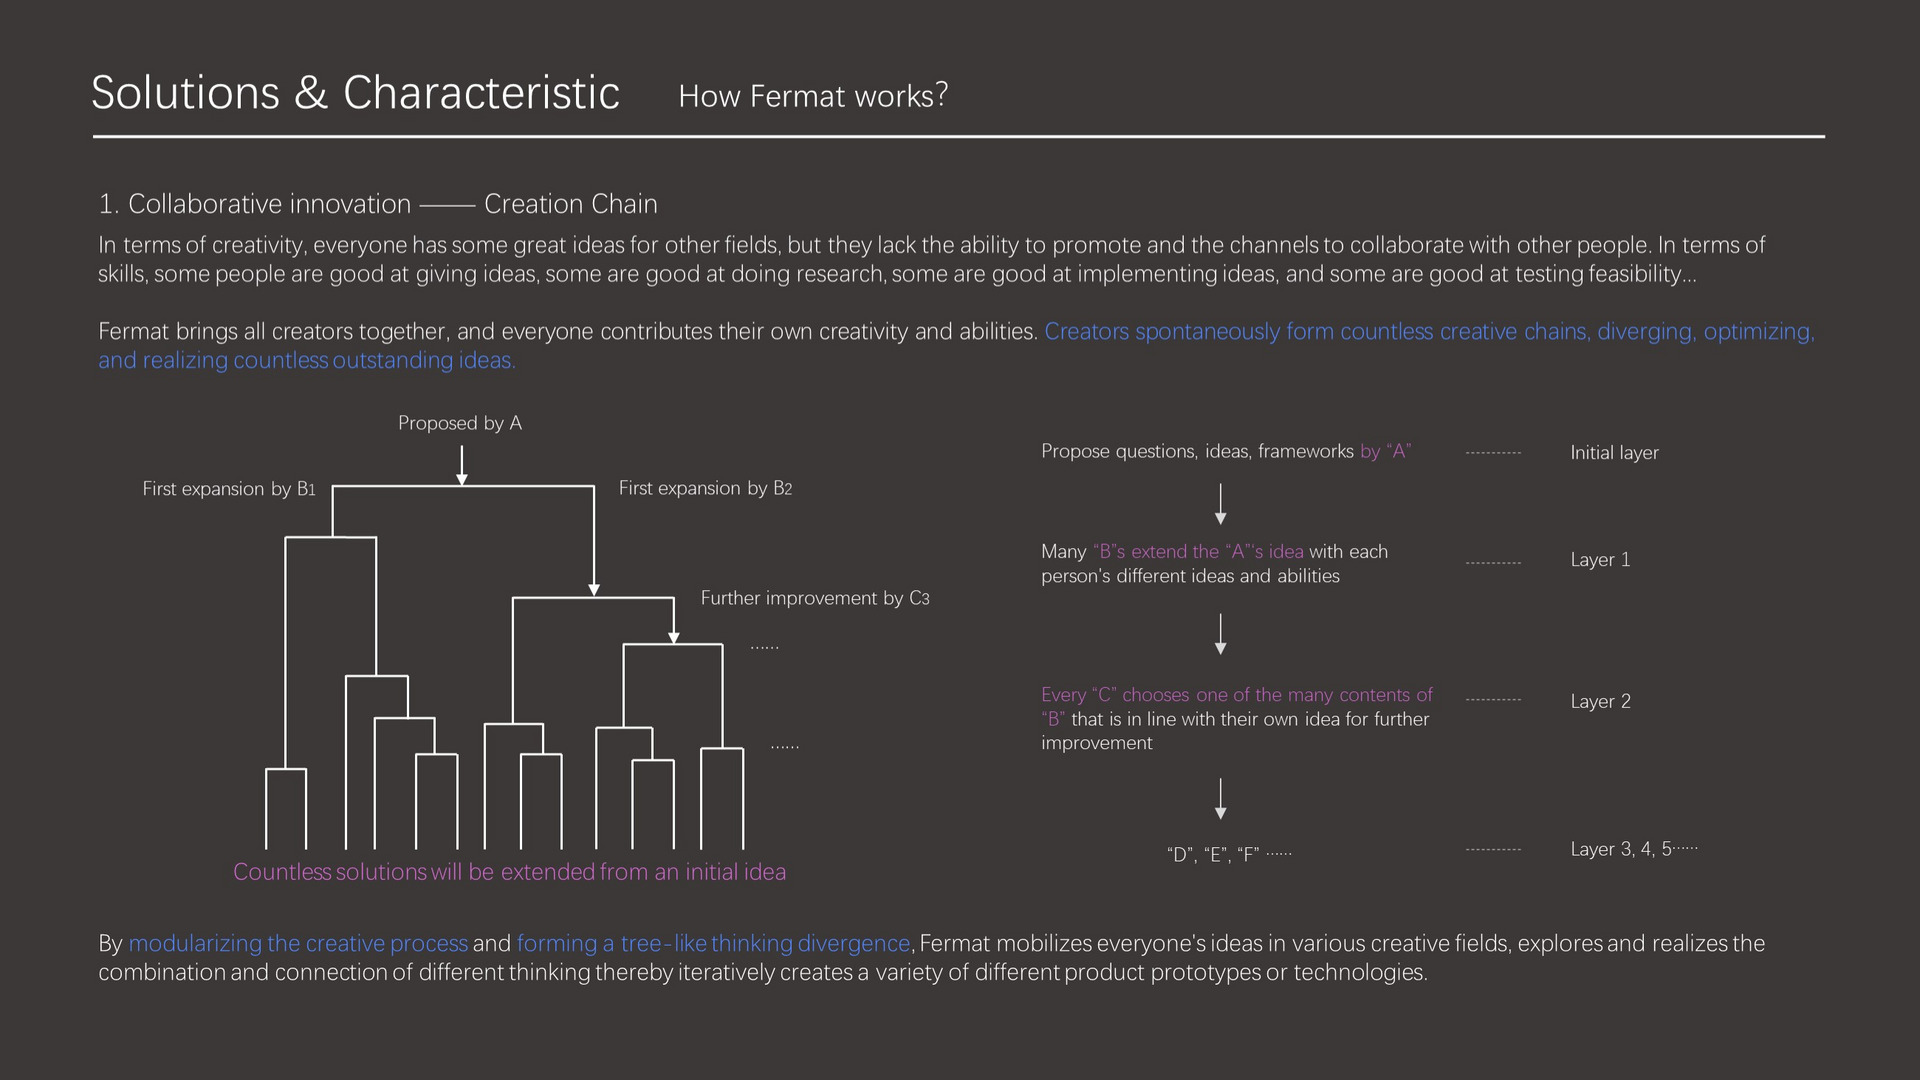 How Fermat works